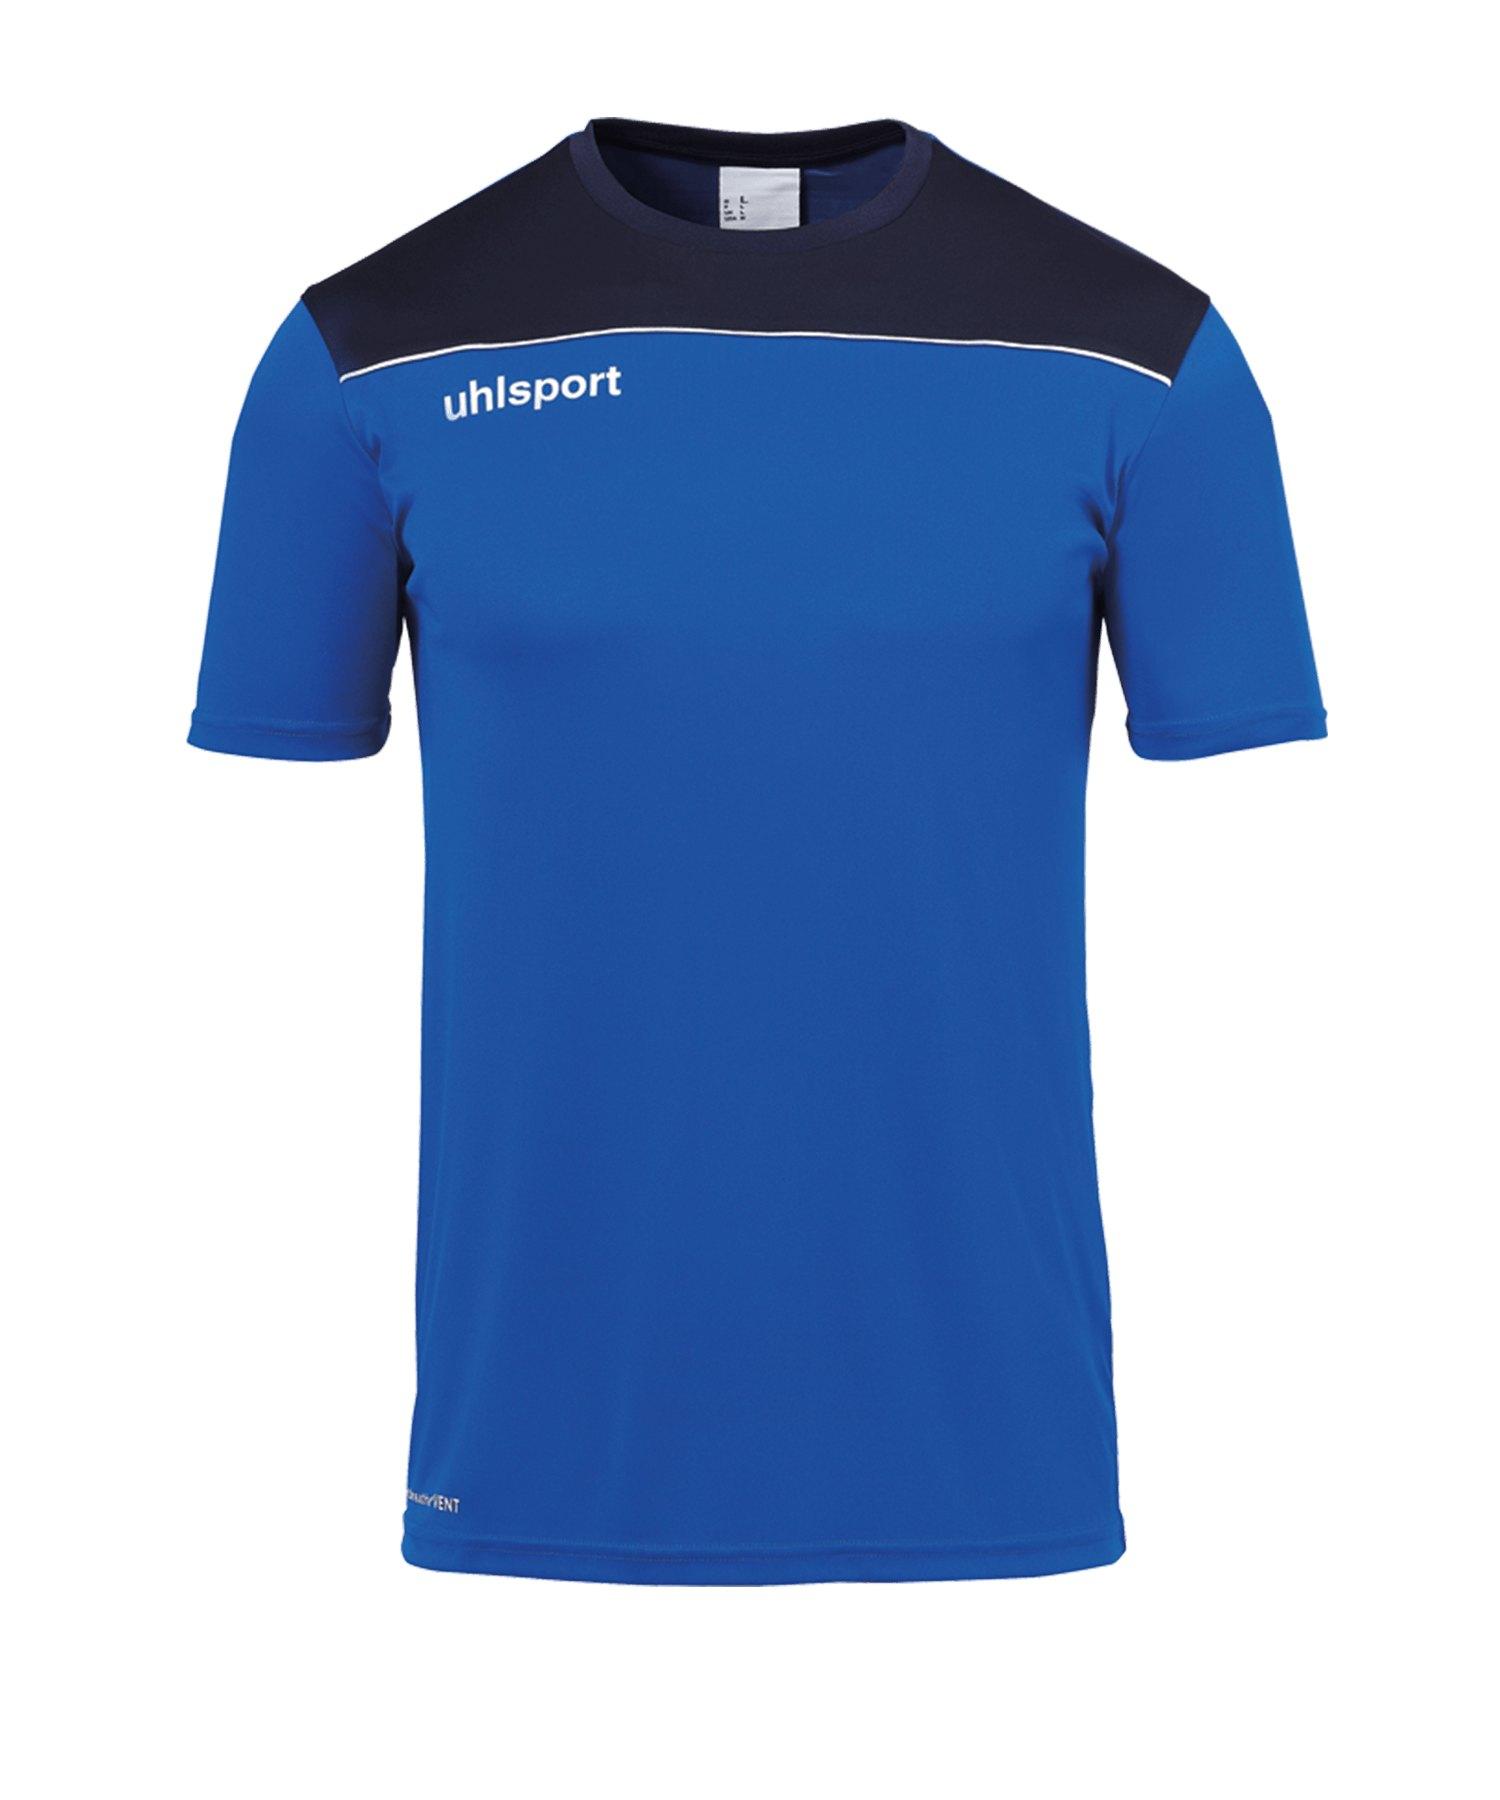 Uhlsport Offense 23 Trainingsshirt Kids Blau F03 - blau